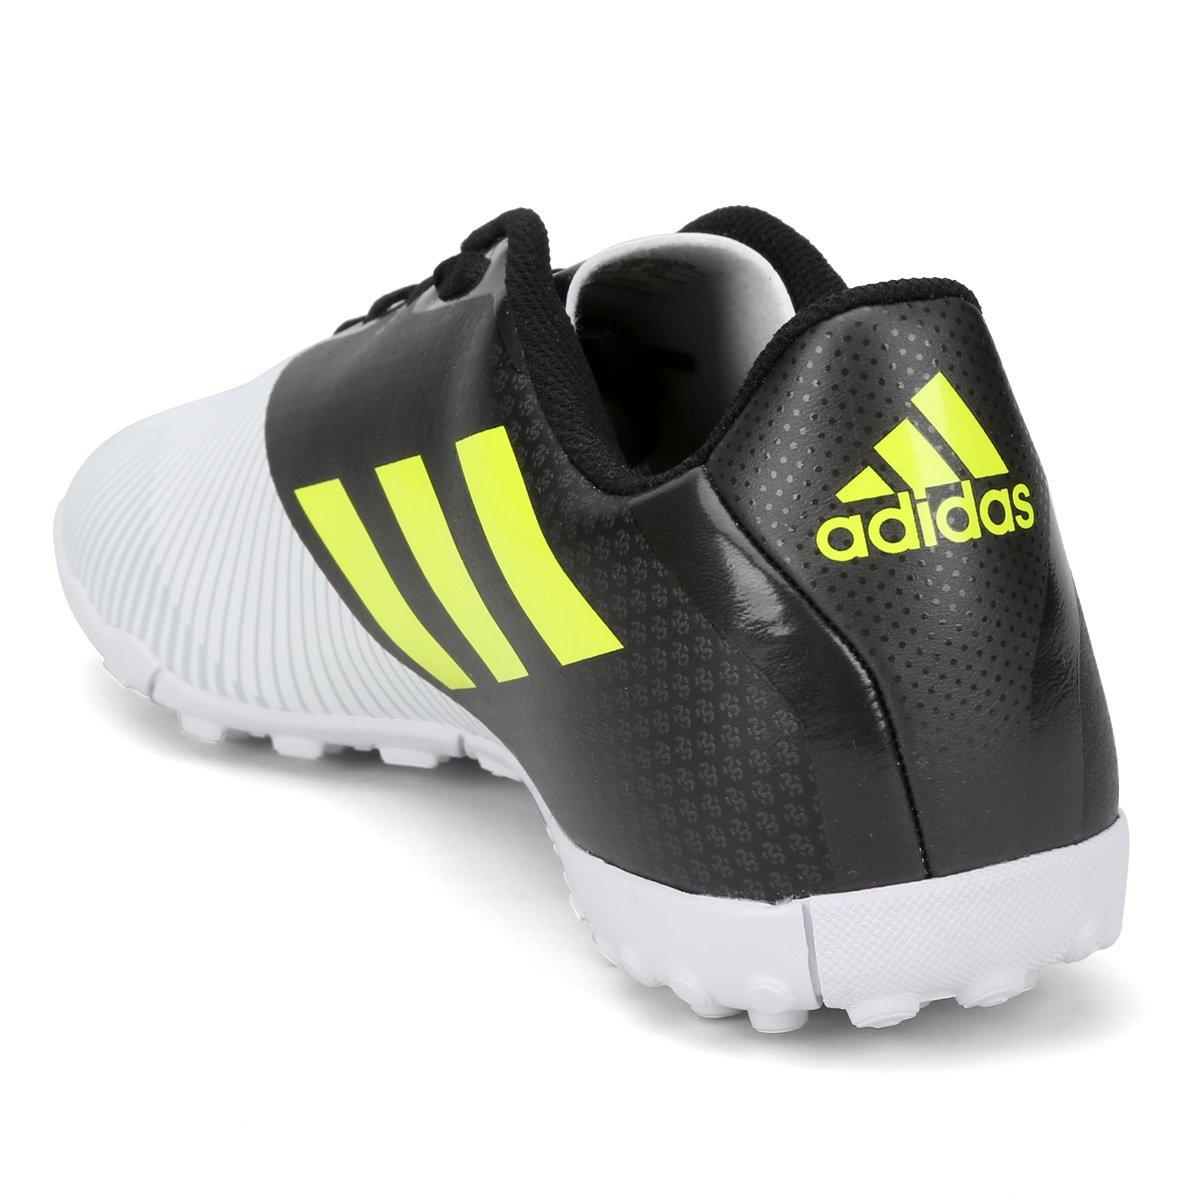 Chuteira 17 Artilheira Adidas Society Chuteira Preto Adidas Society Artilheira Masculina TF pFwqSxP6tn